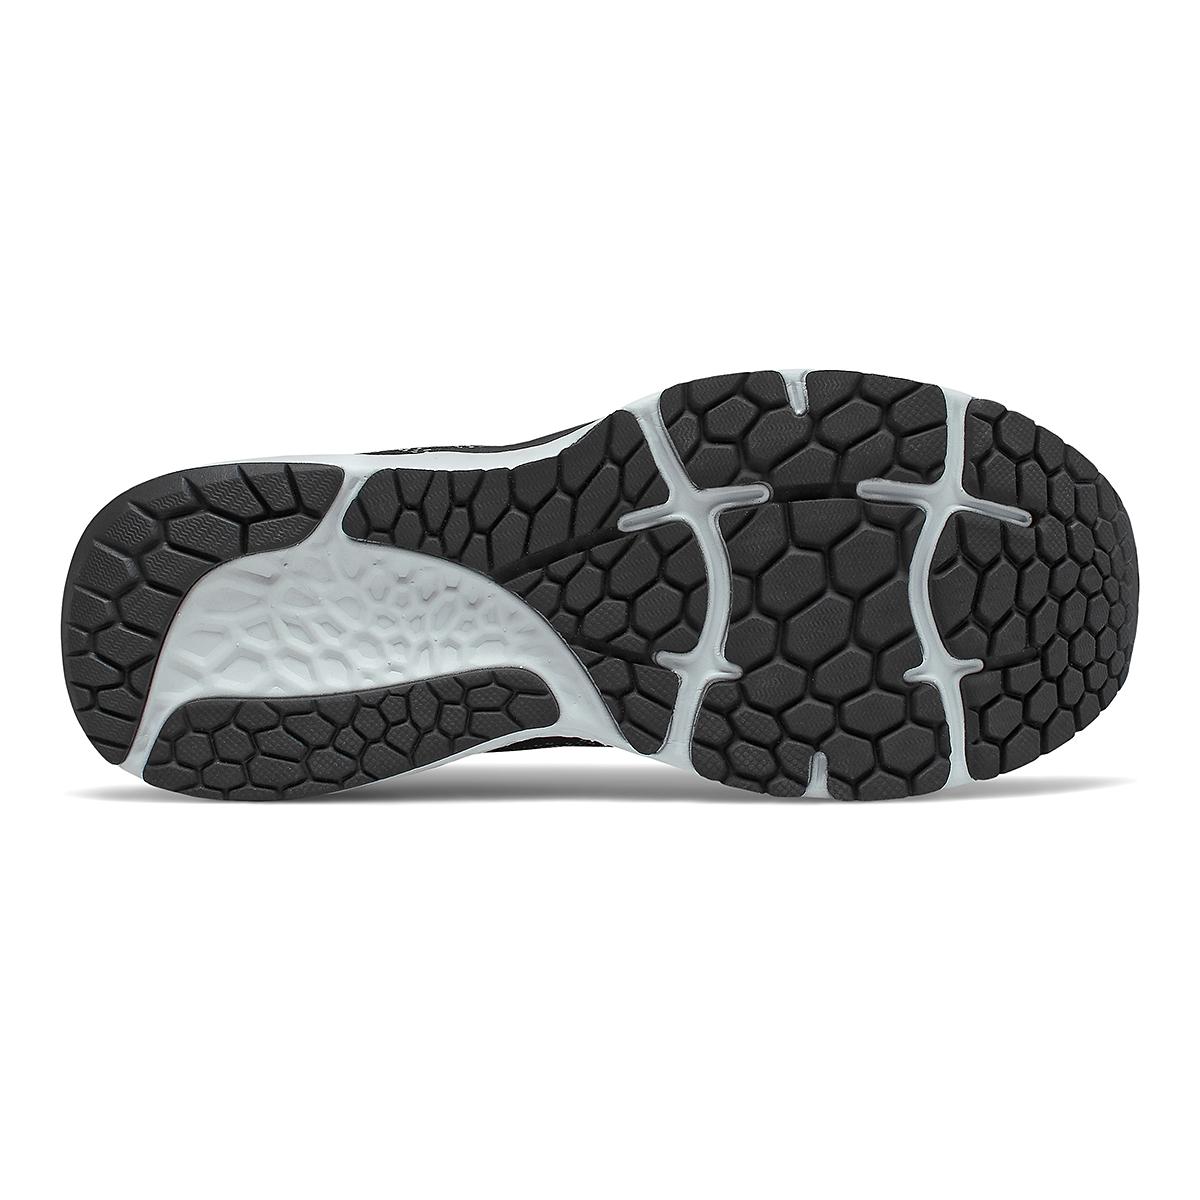 Women's New Balance 880V11 Running Shoe - Color: Black/Star Glo - Size: 5 - Width: Narrow, Black/Star Glo, large, image 4